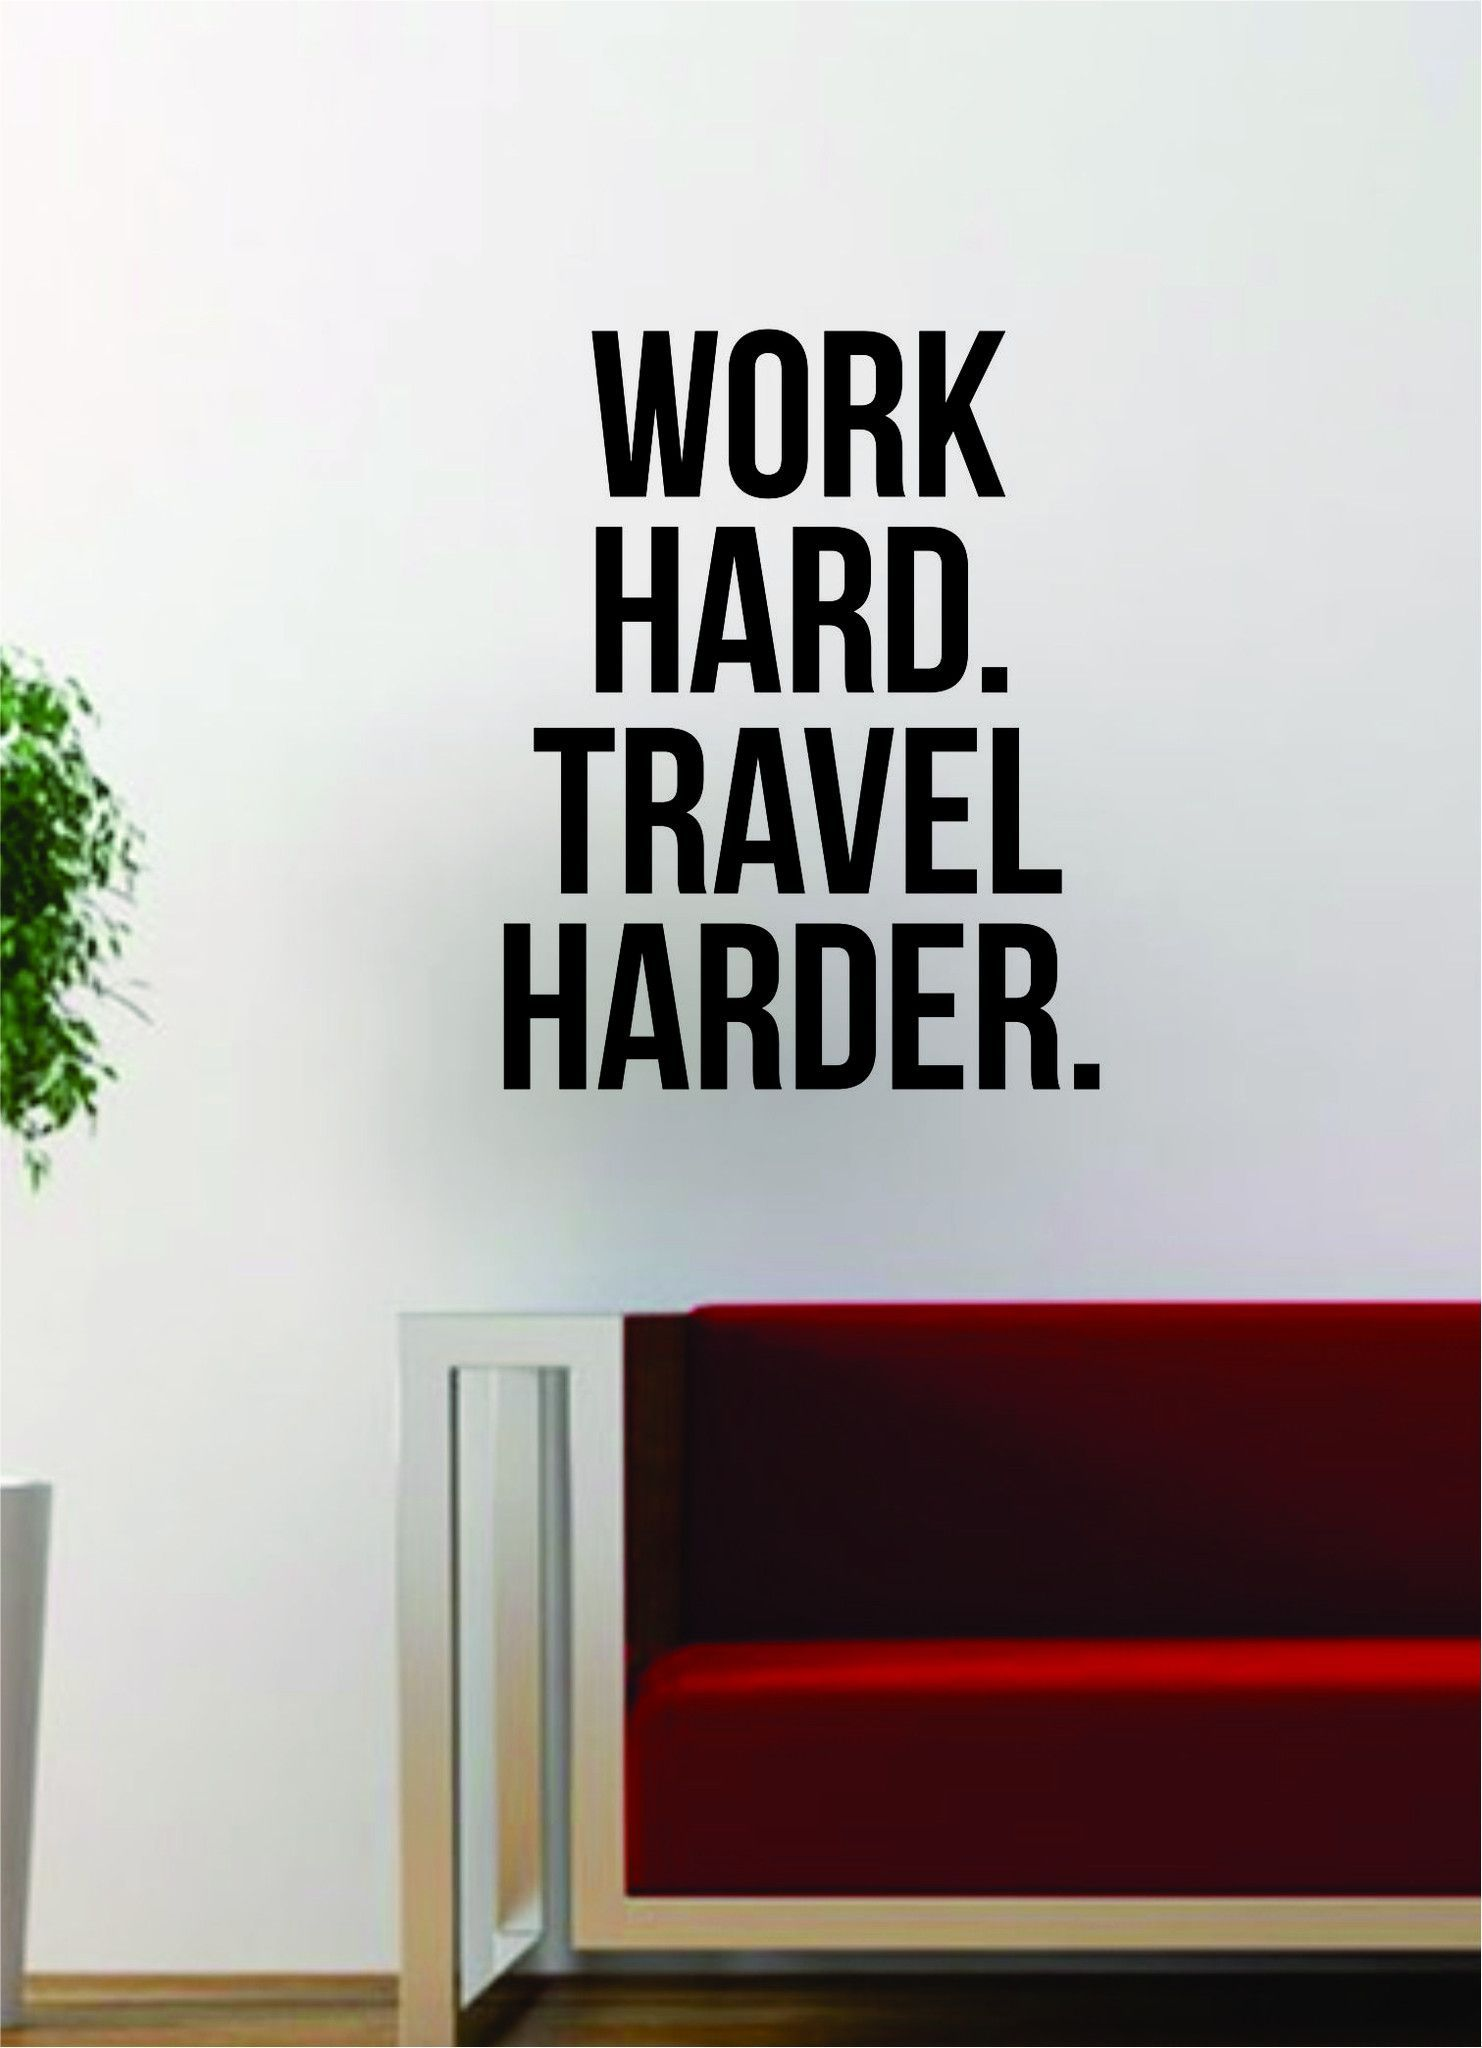 Work Hard Travel Harder Quote Decal Sticker Wall Vinyl Art Words - Custom vinyl decals quotes   beginning business